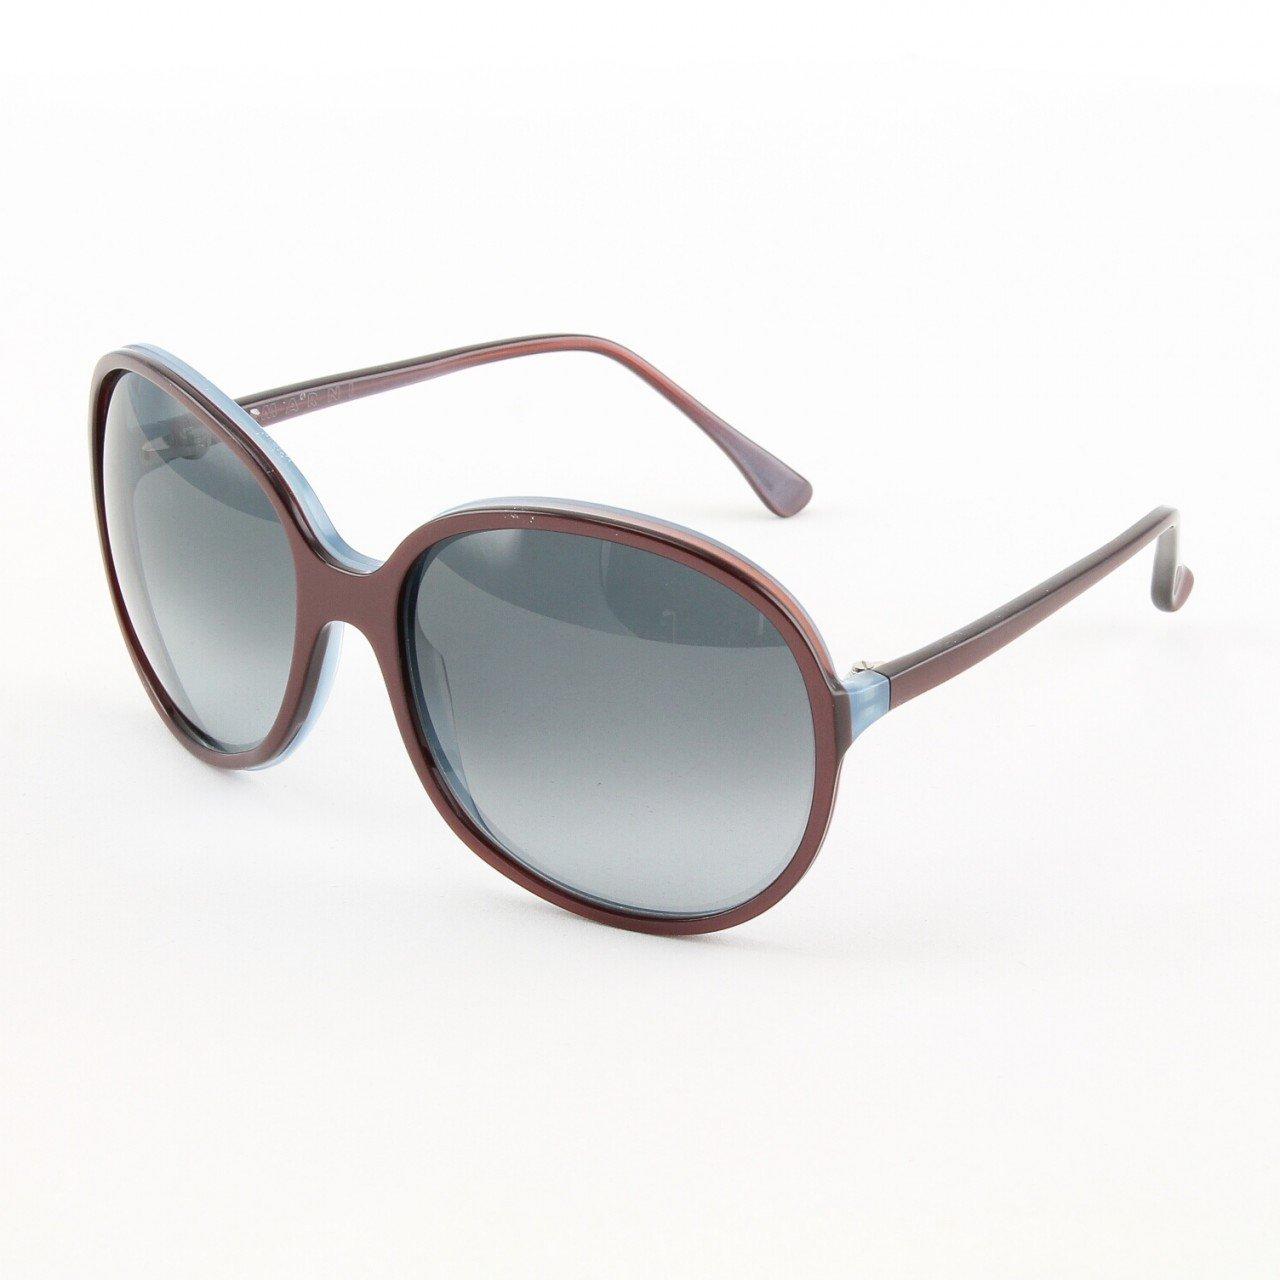 Marni MA165S Sunglasses 12 Oversized Deep Plum Frame, Gray Gradient Lenses